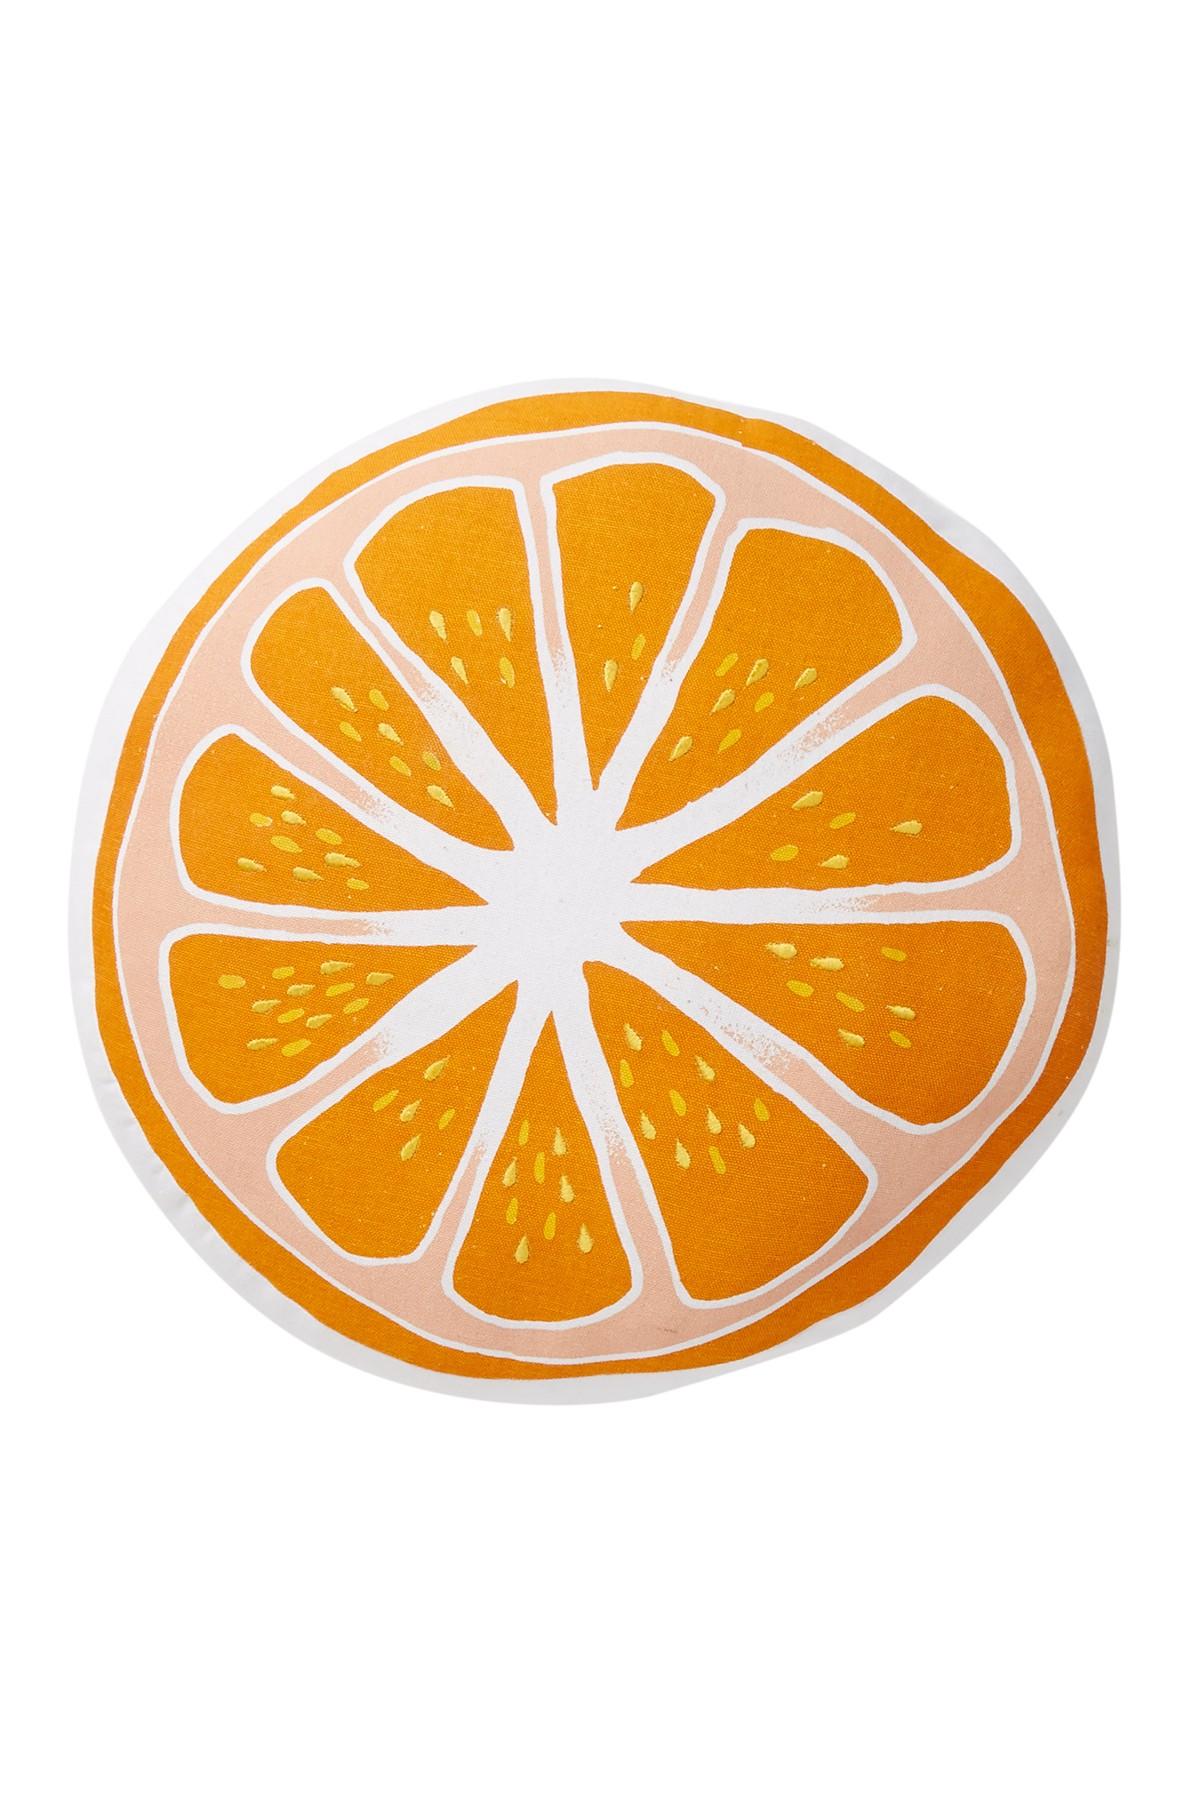 Orange (Fruit) clipart shape Orange Orange of Pillow Fruit